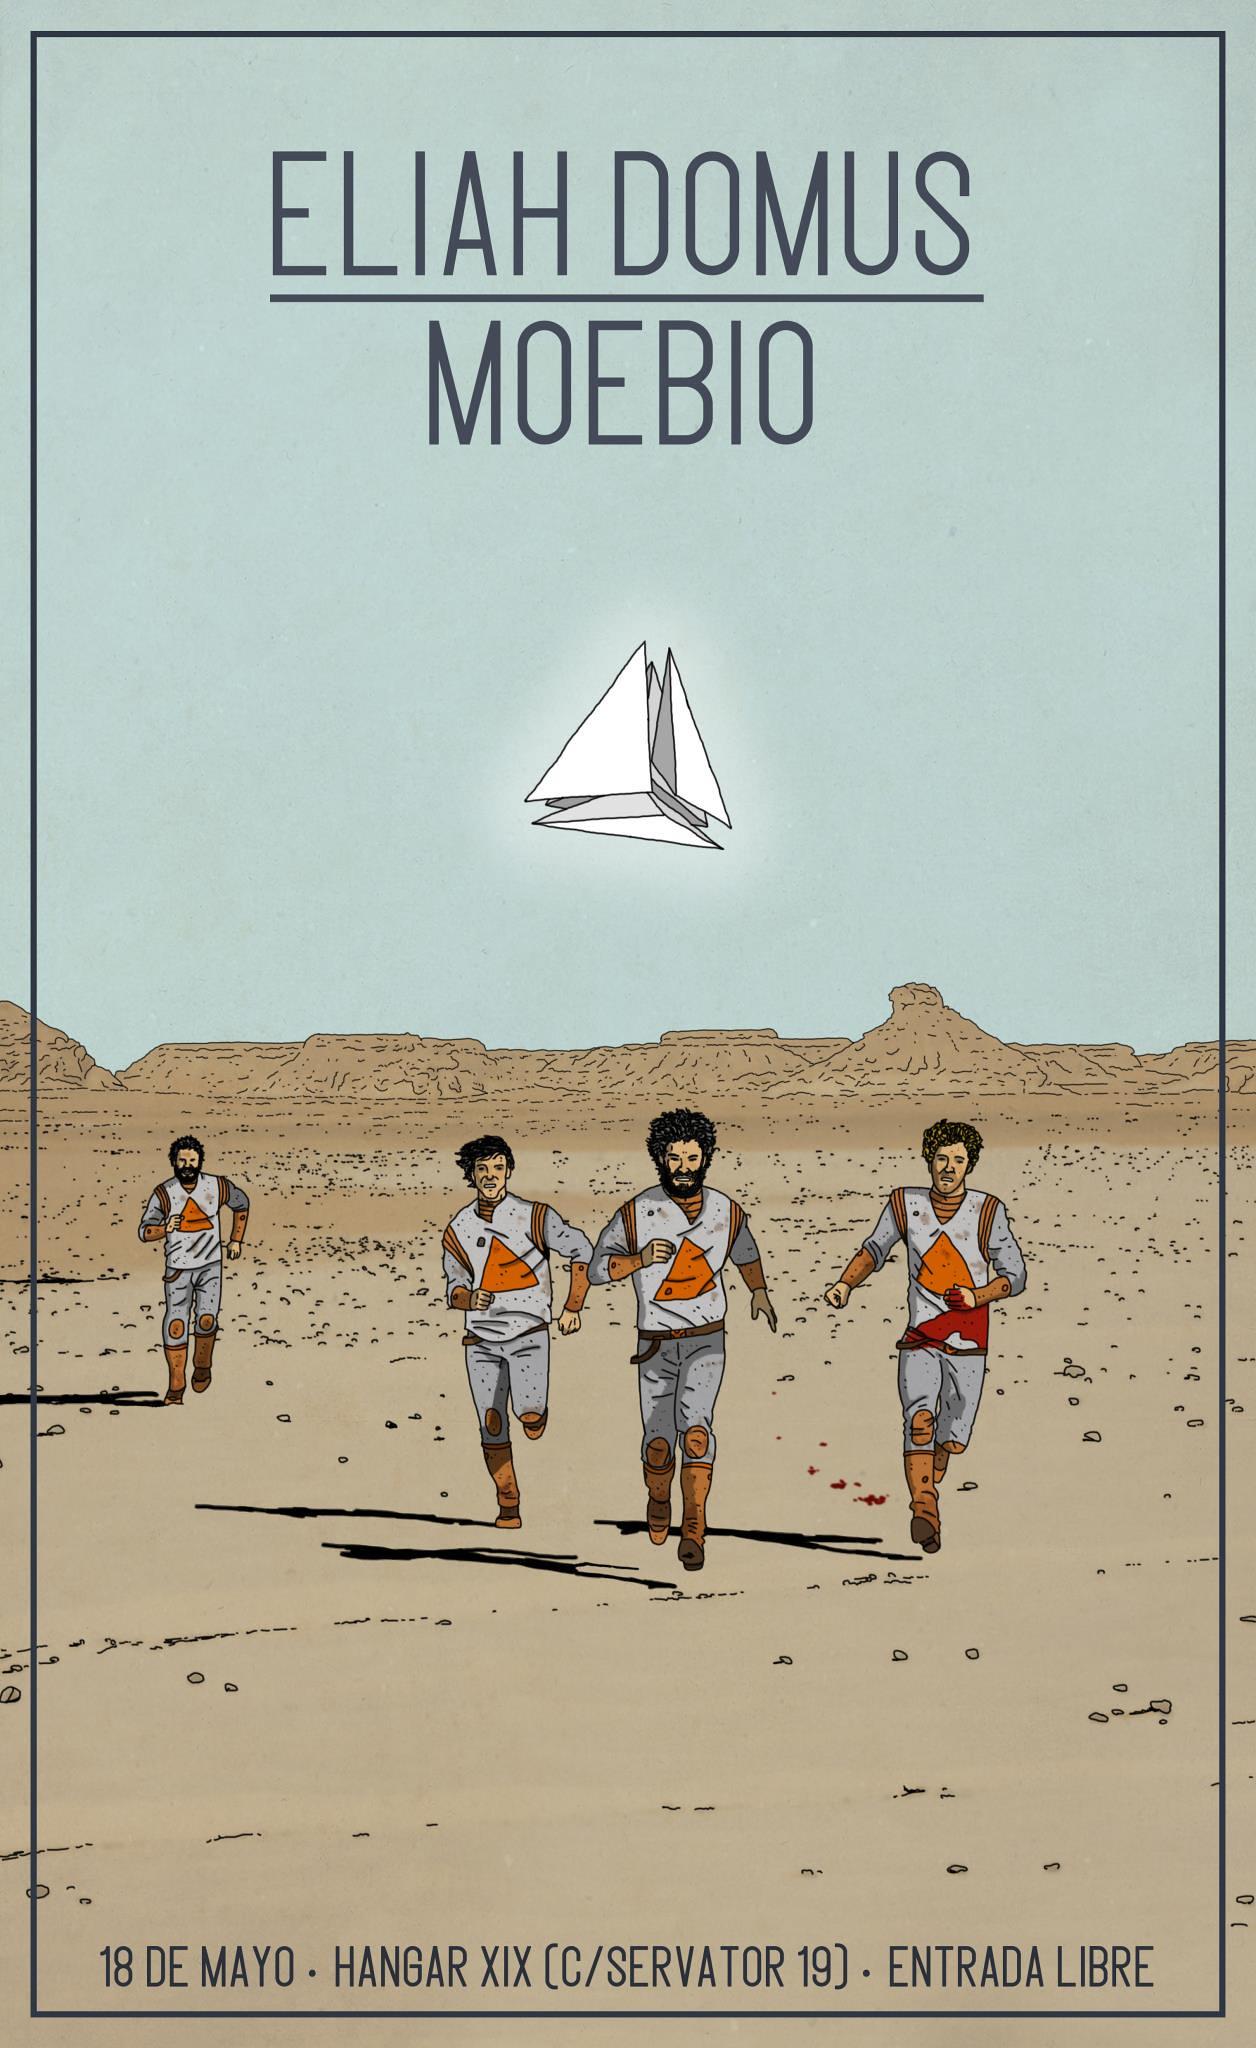 MOEBIO + ELIAH DOMUS